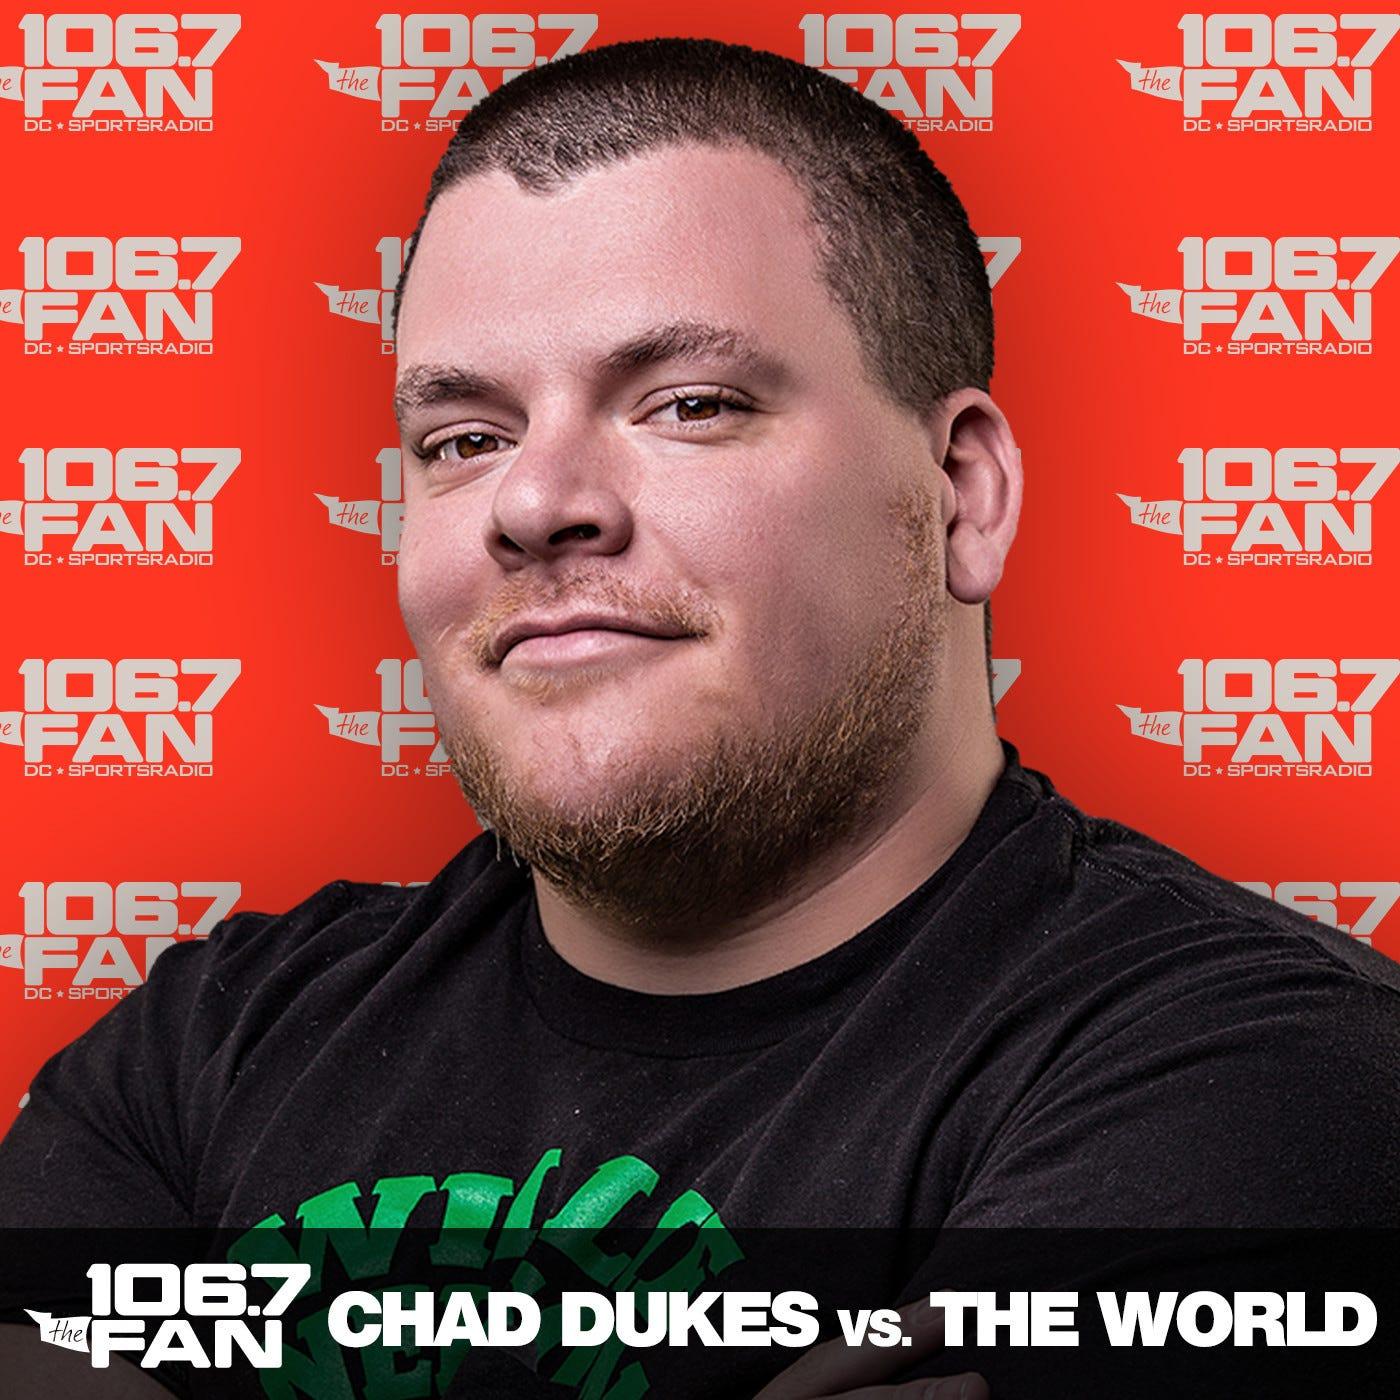 Chad Dukes Vs. the World